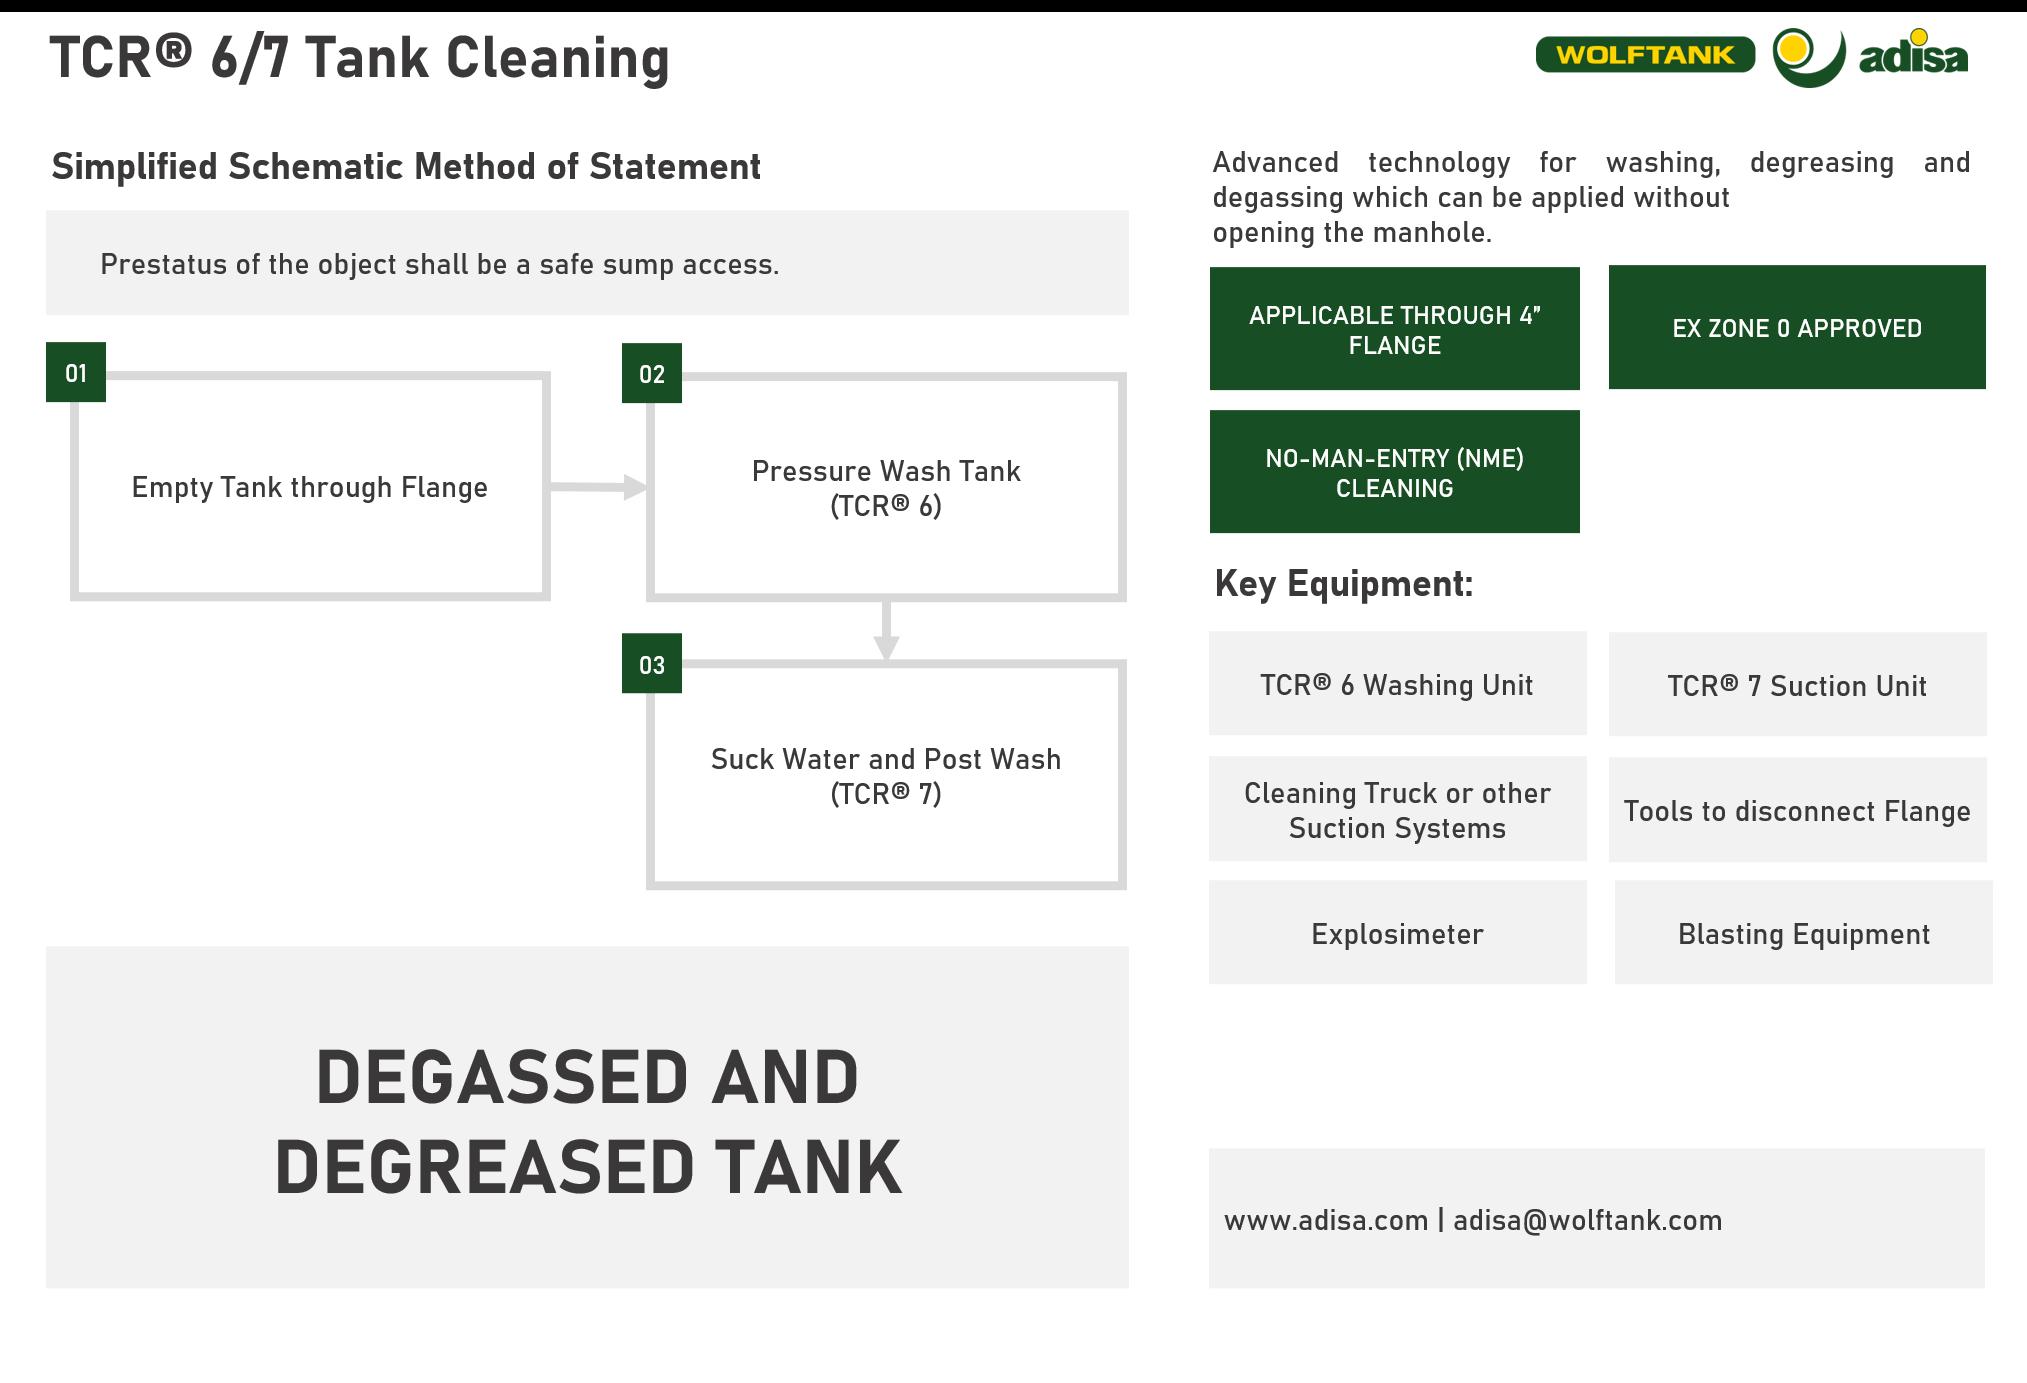 TCR 6 - 7 Tank Cleaning - Simple Method Statement - Wolftank Adisa